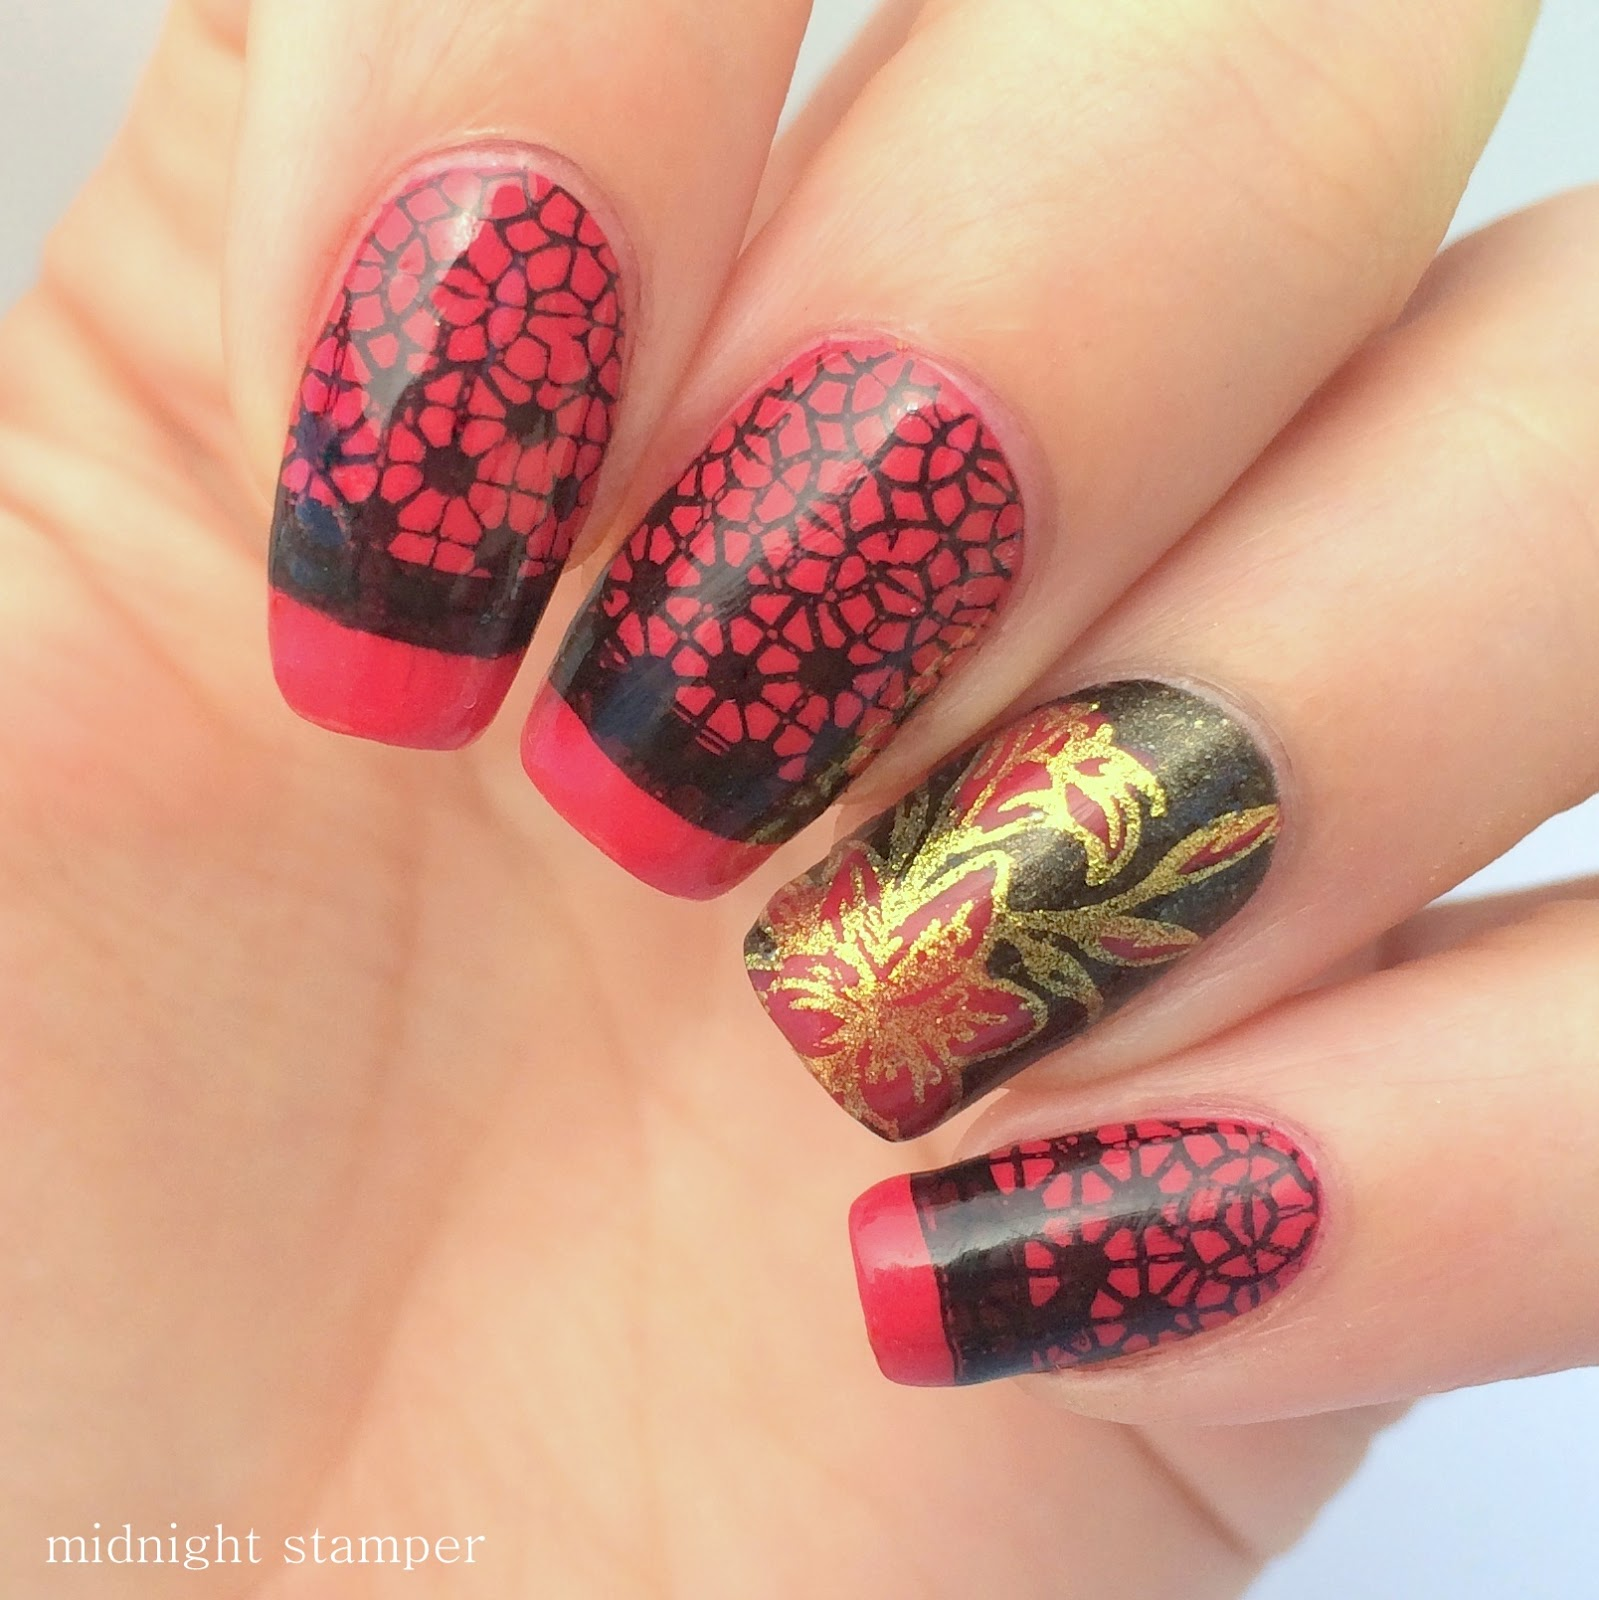 Midnight Stamper 26 Great Nail Art Ideas Work Appropriate Nail Art